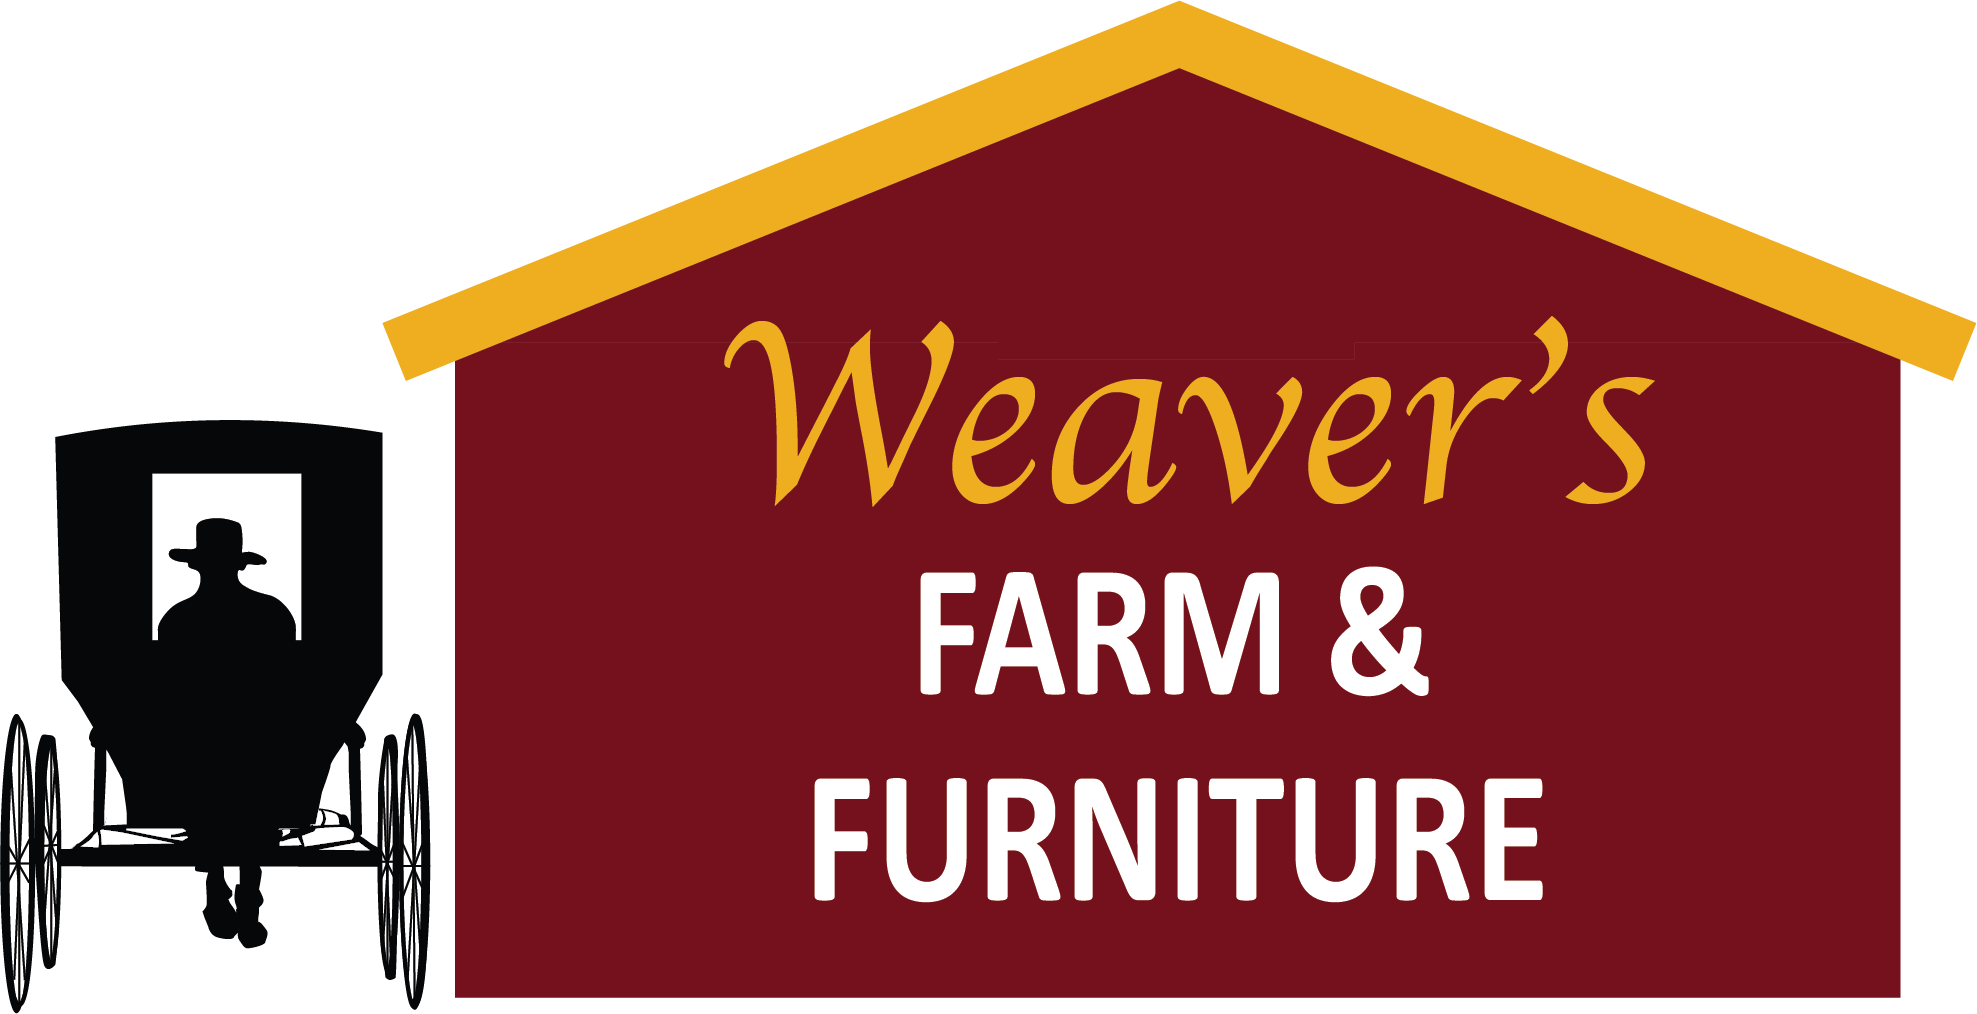 weaversMaroon602